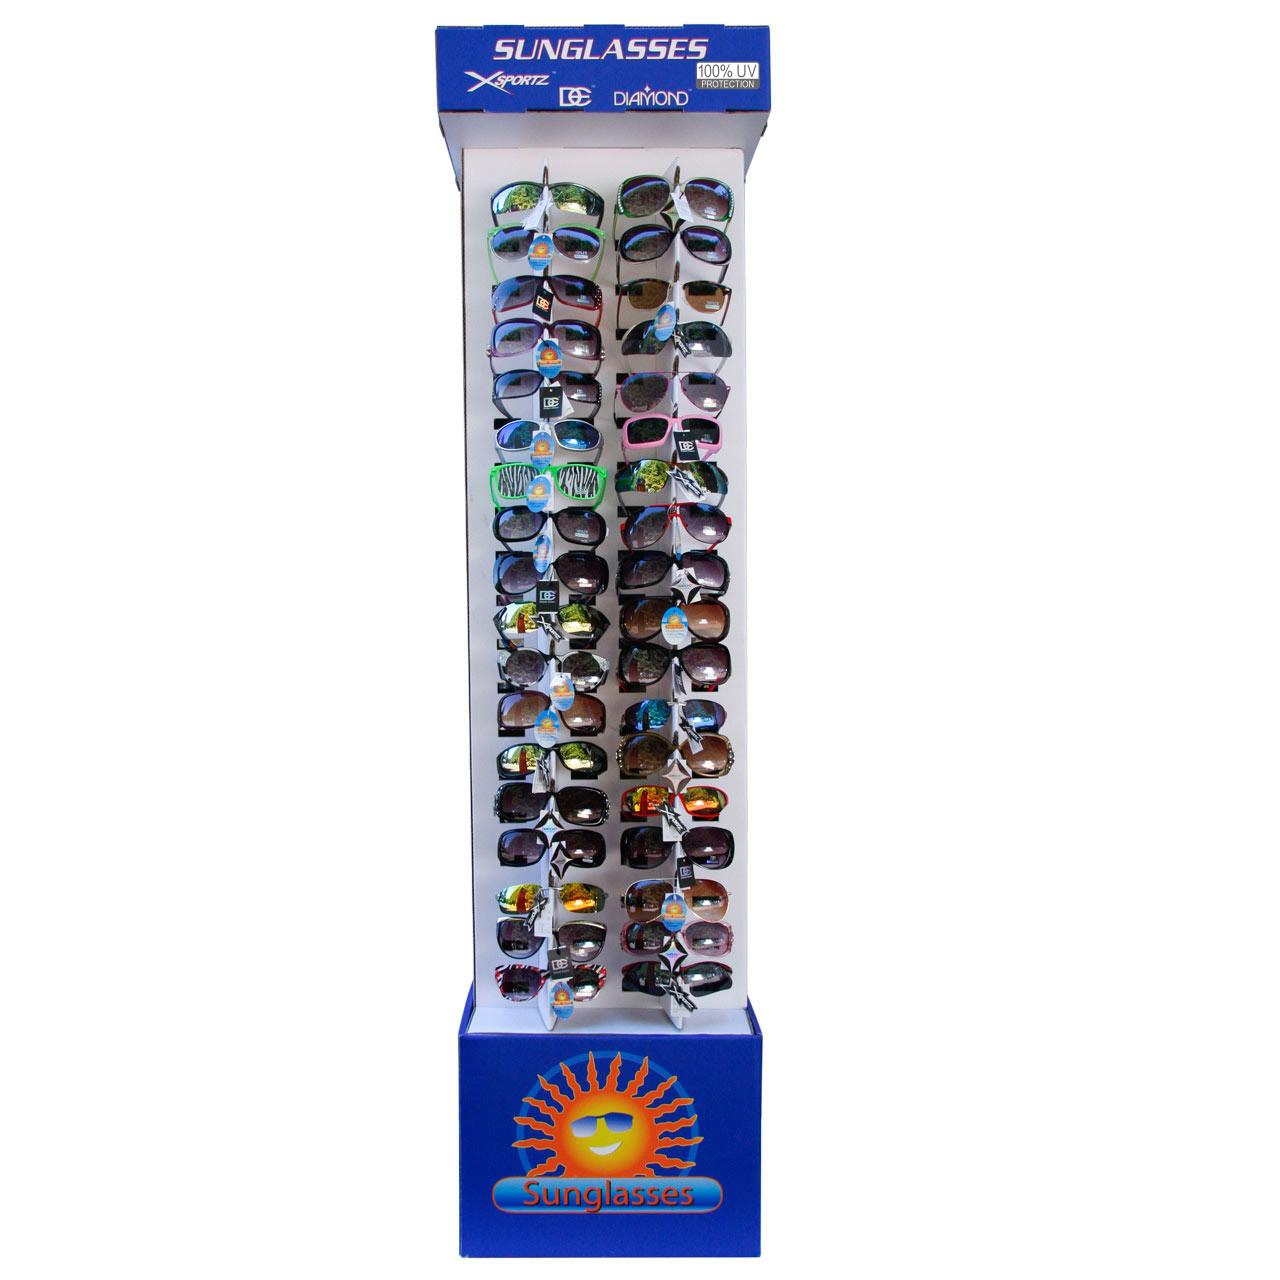 Cardboard Sunglass Display 7002 Holds 72 Pair